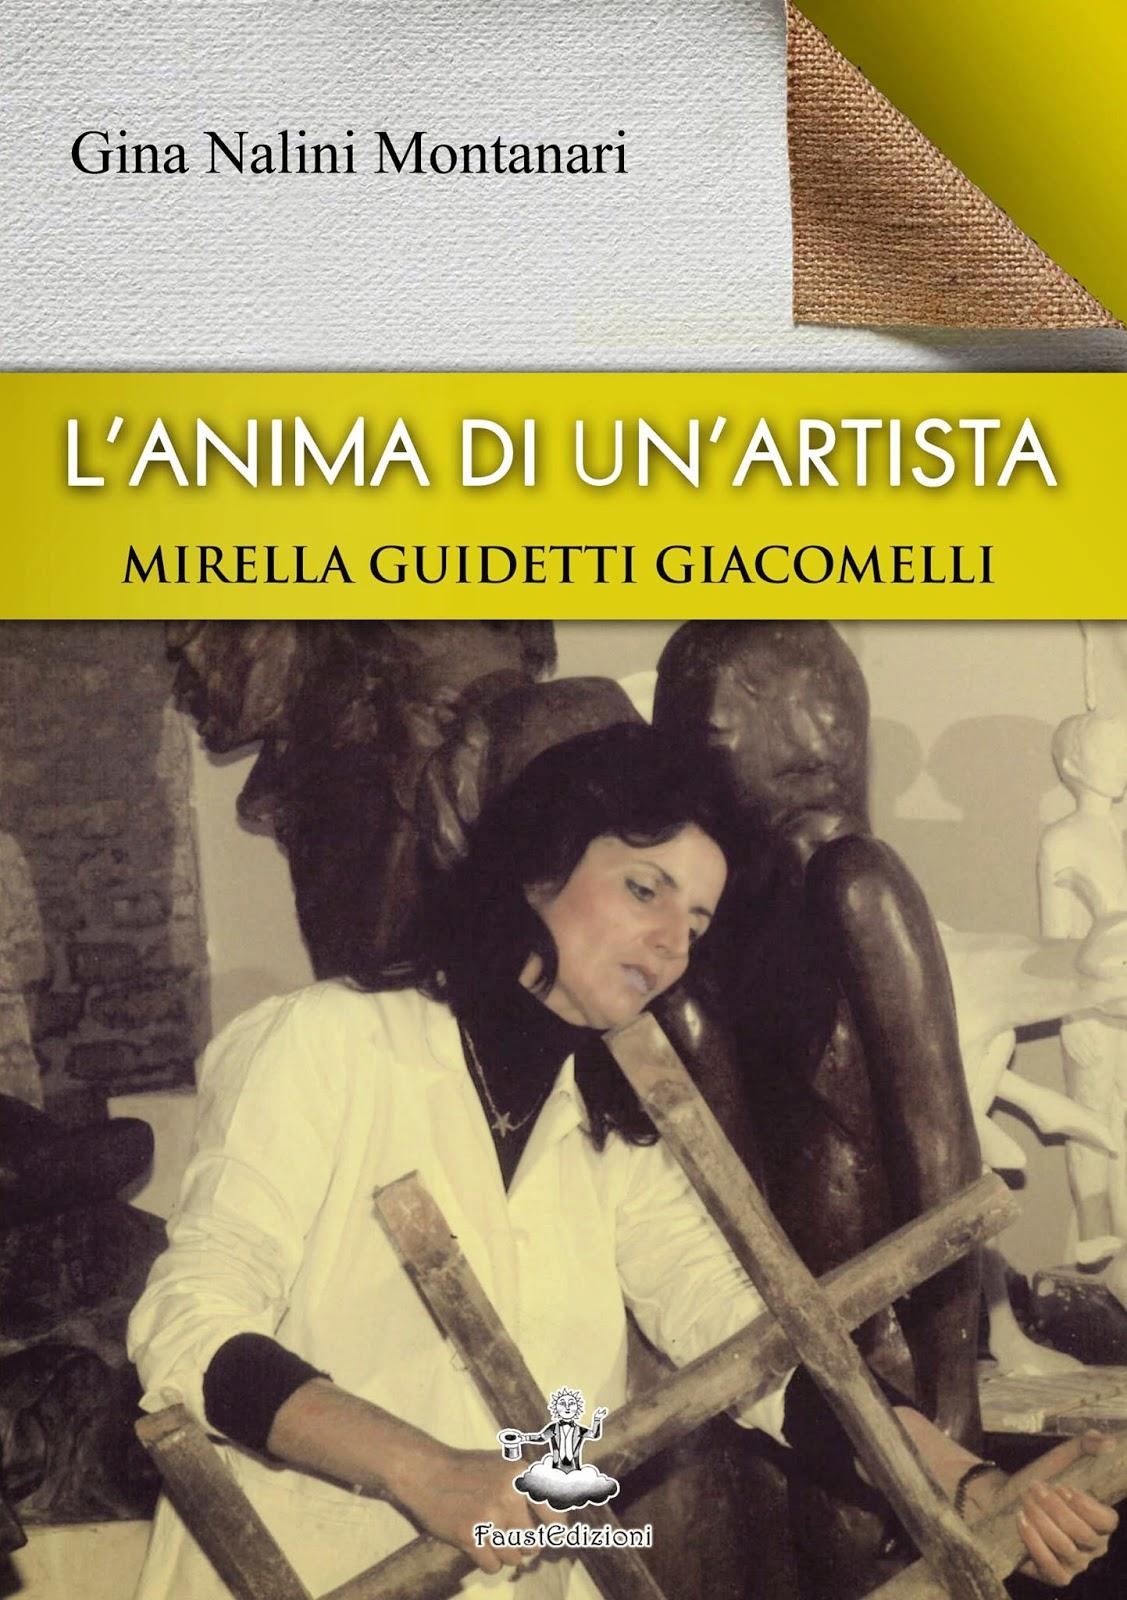 http://www.ibs.it/code/9788898147137/nalini-montanari-gina/anima-artista-mirella.html